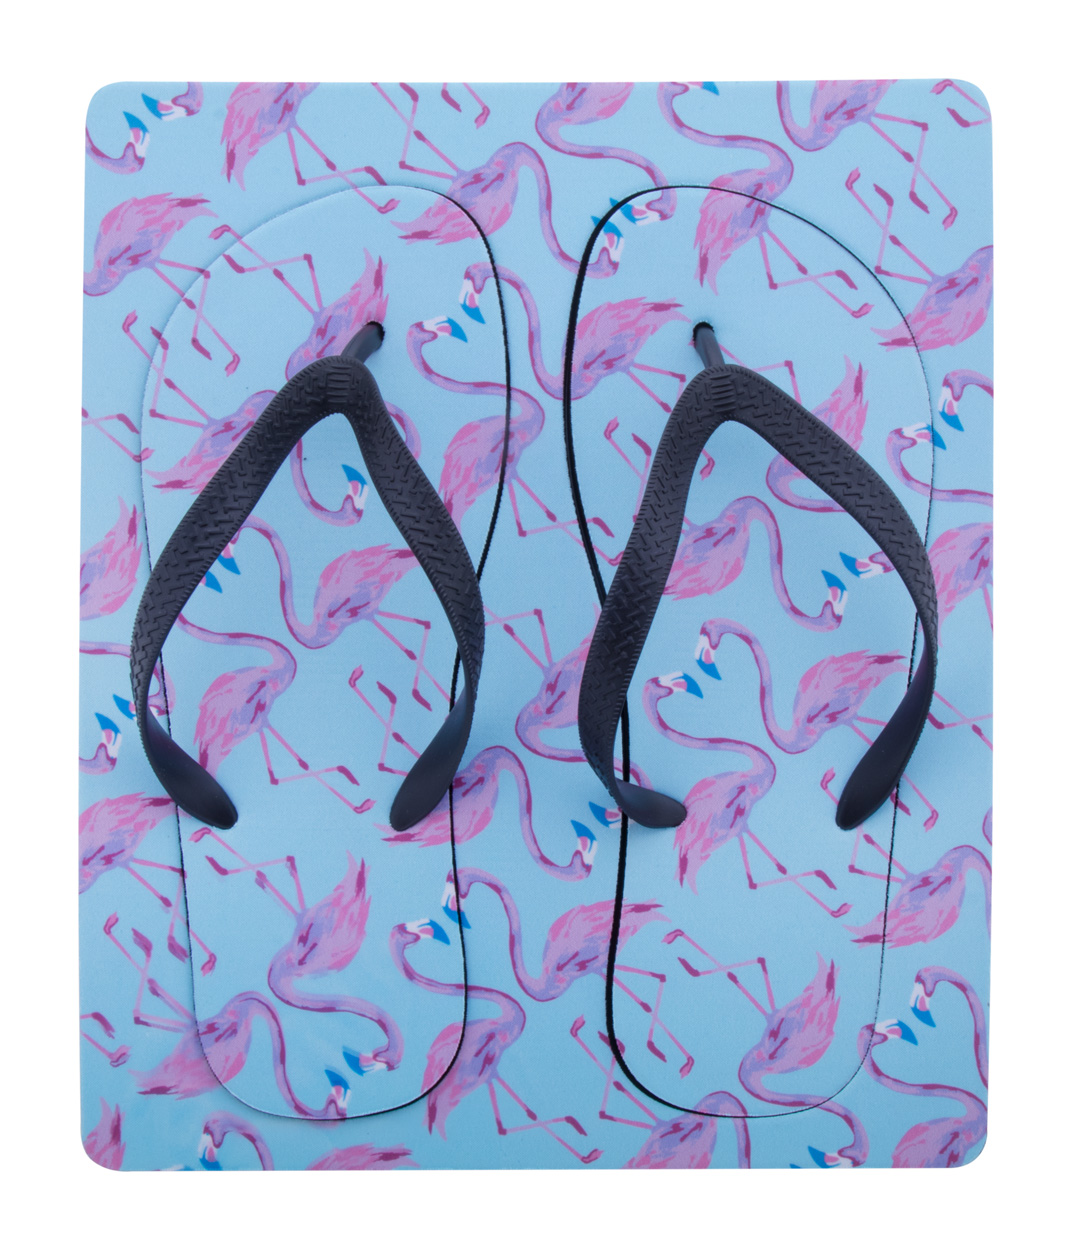 Suboslip sublimation beach slippers